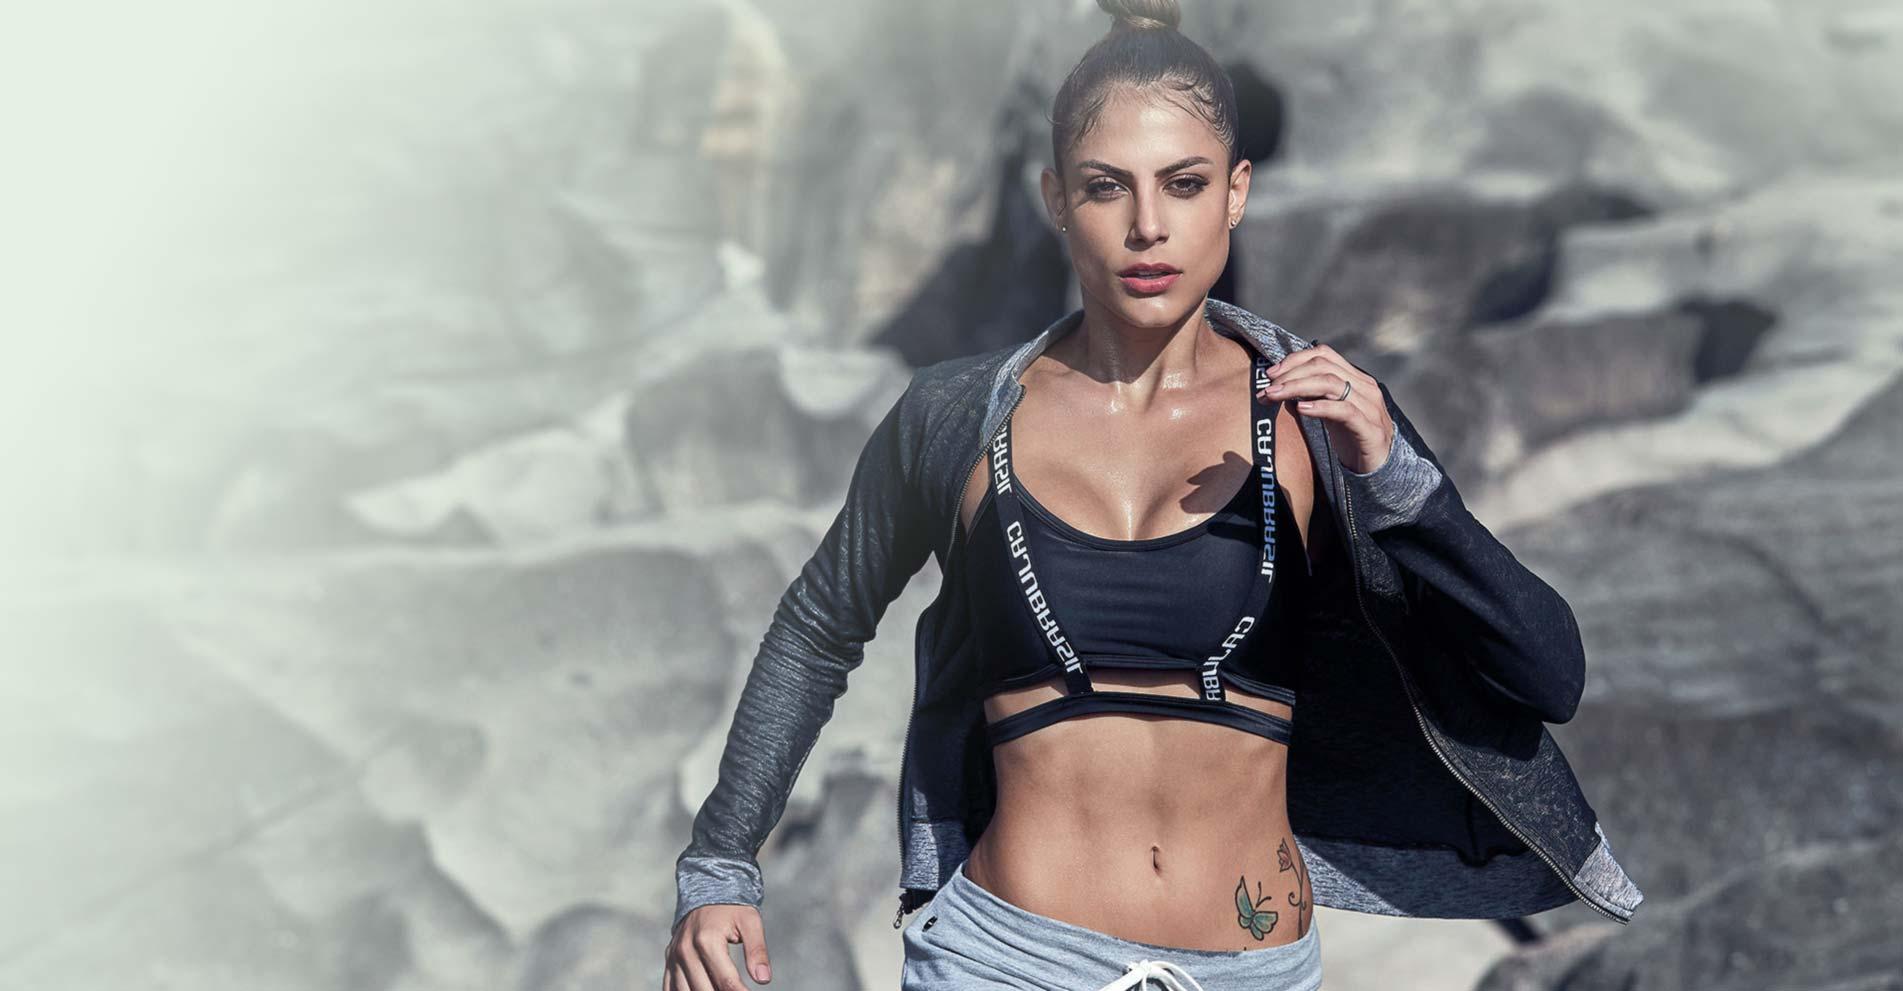 Brazilian Fashion Fitness - Slide 2